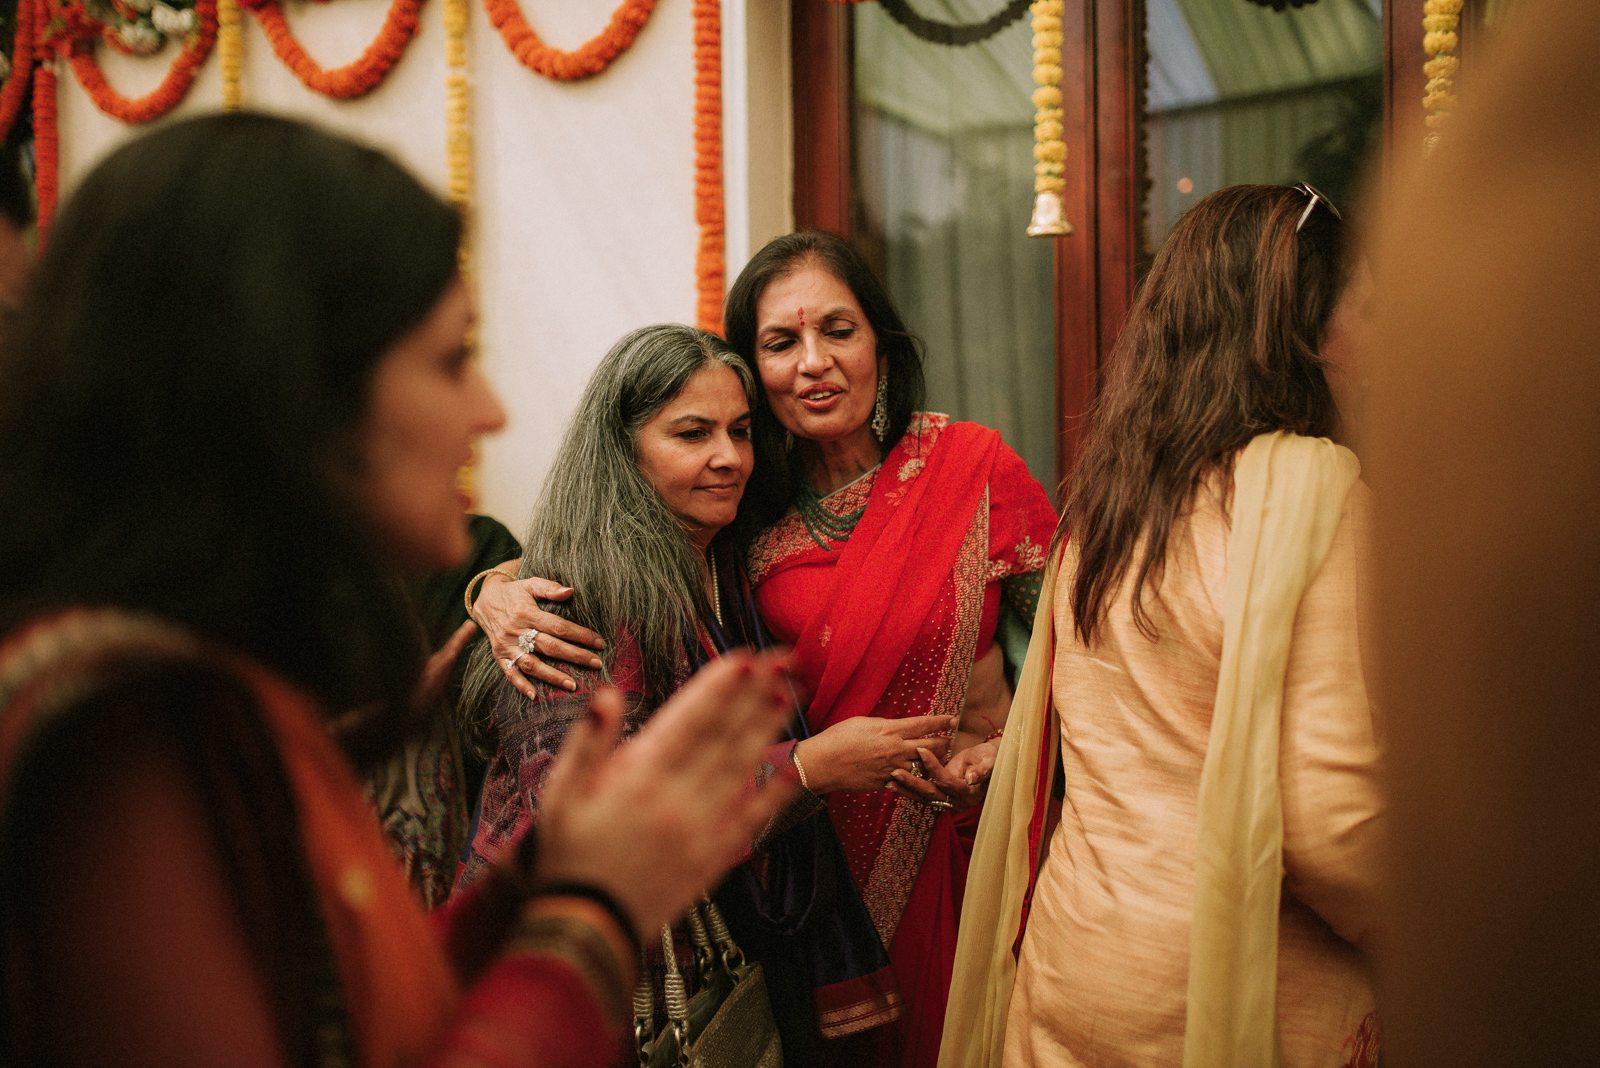 wedding in india - destination wedding photographer-20.jpg